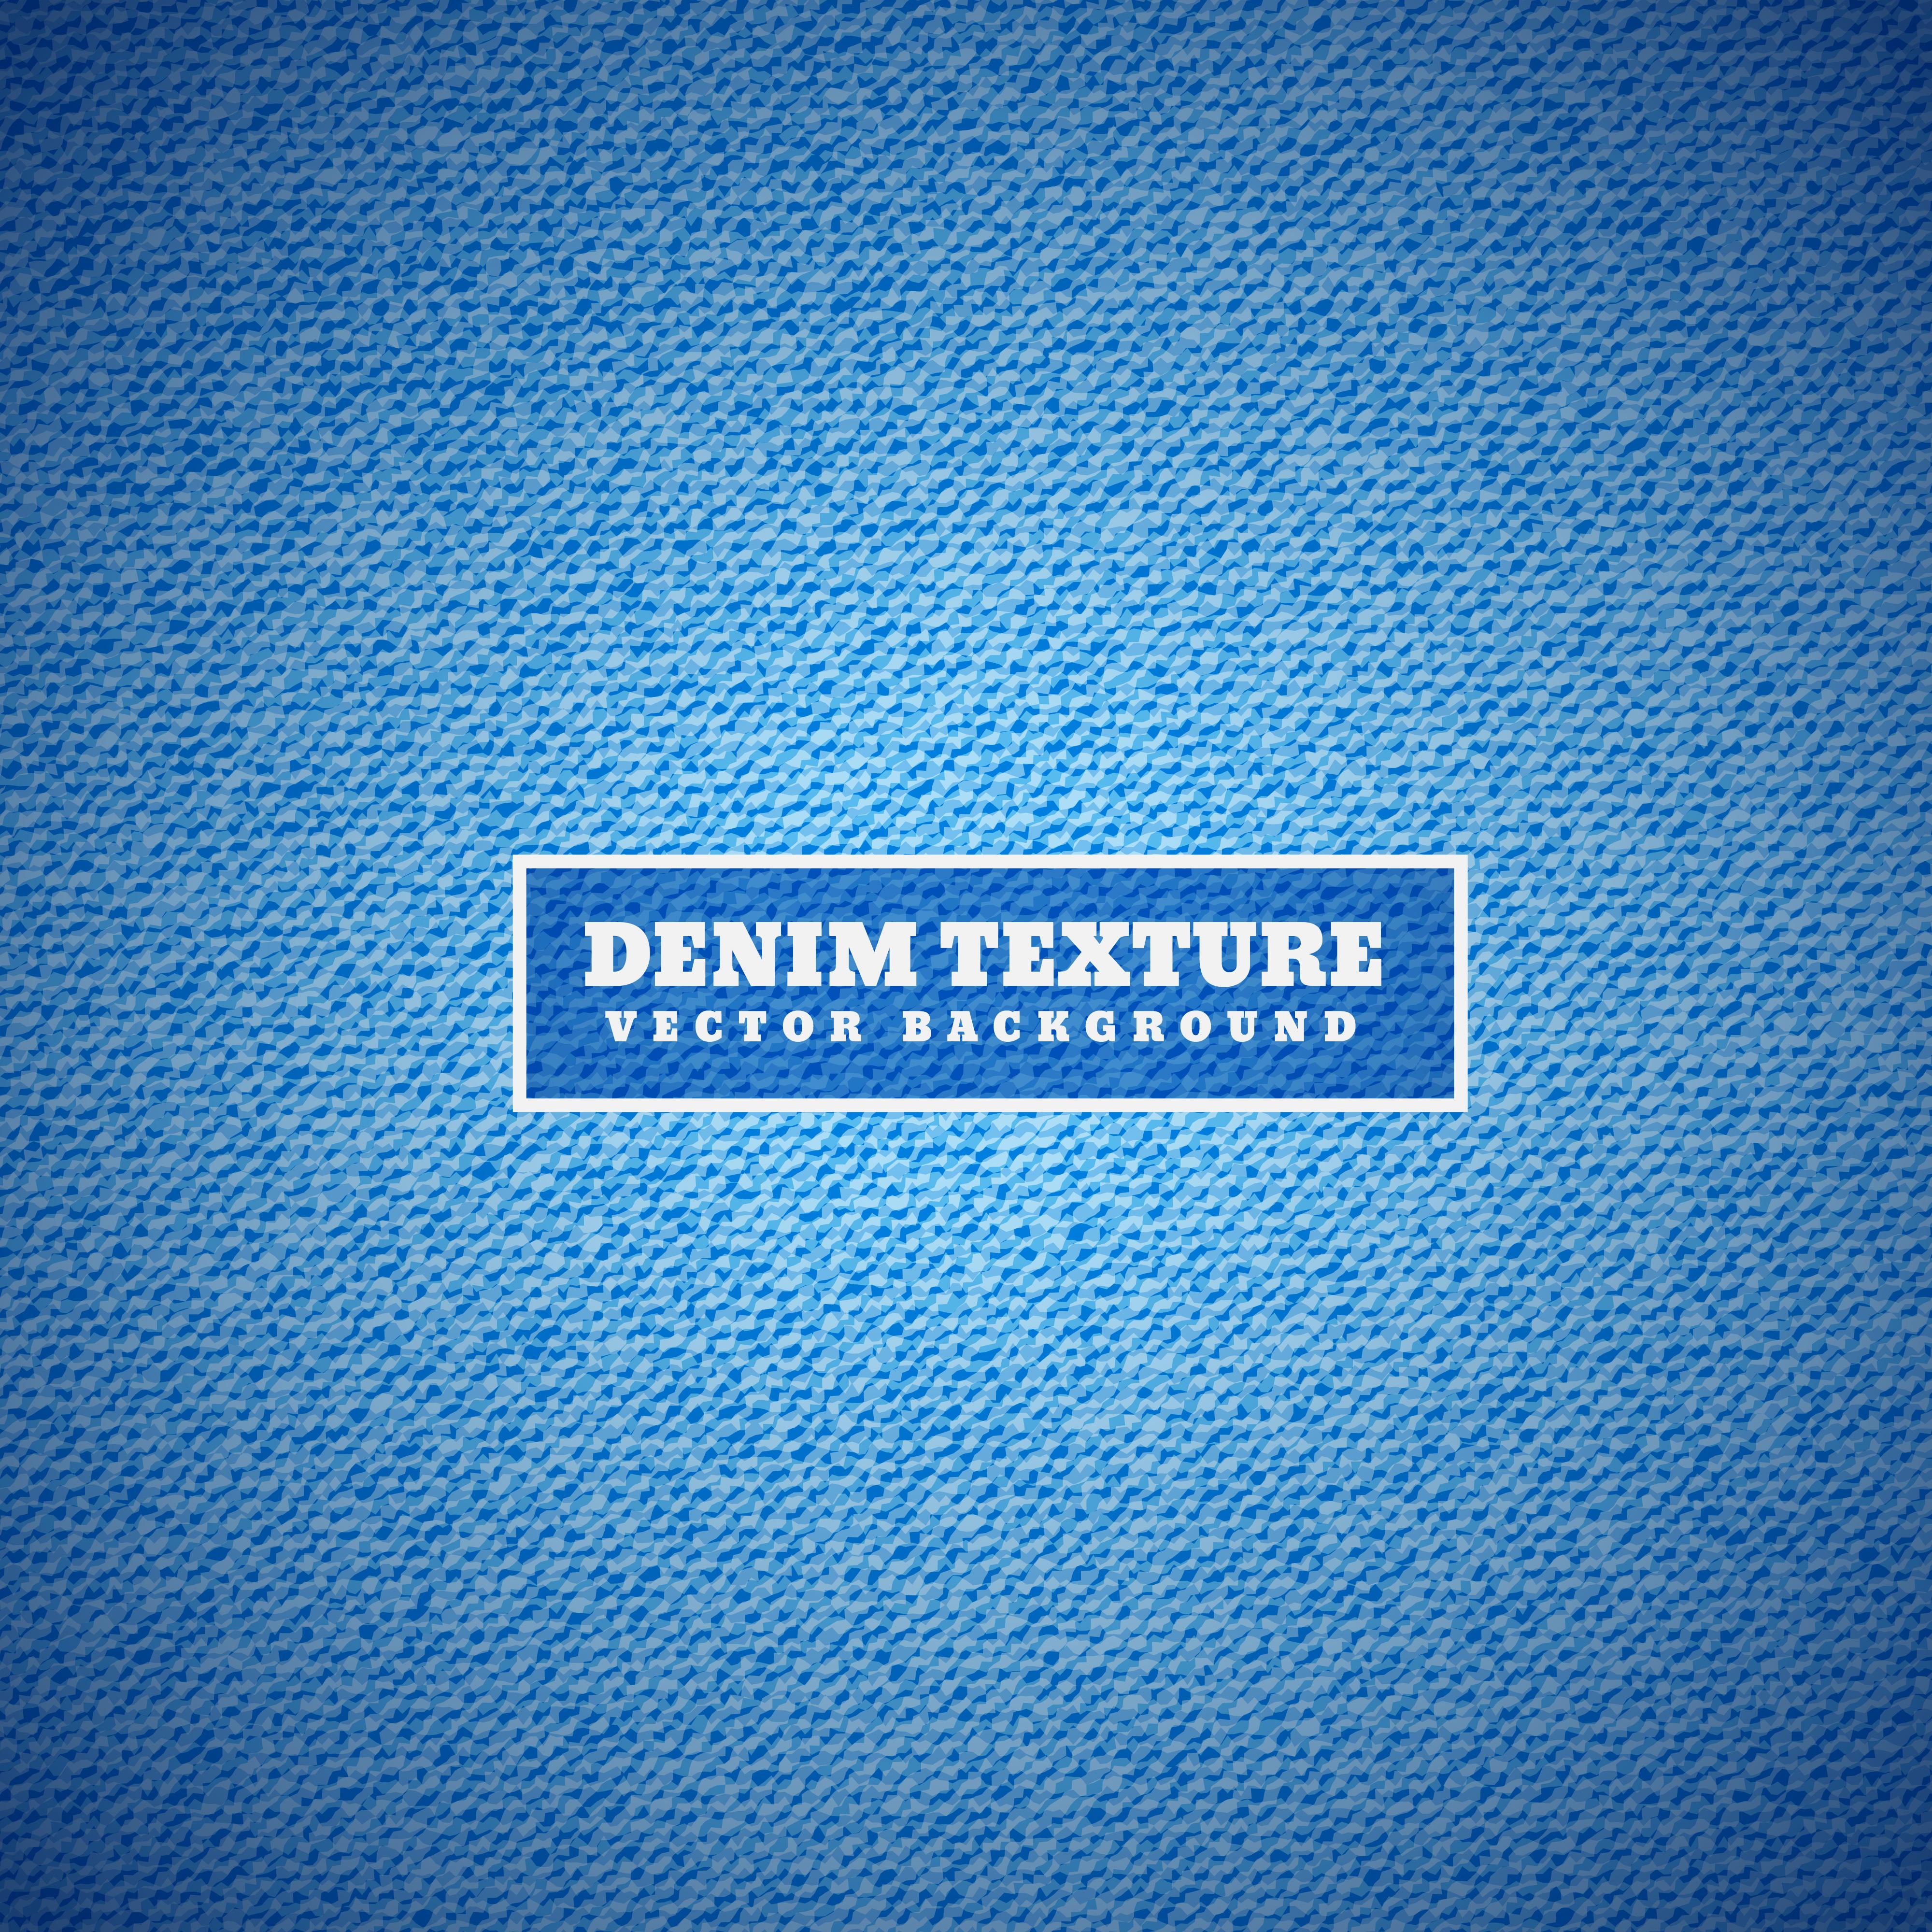 light blue denim texture download free vector art stock